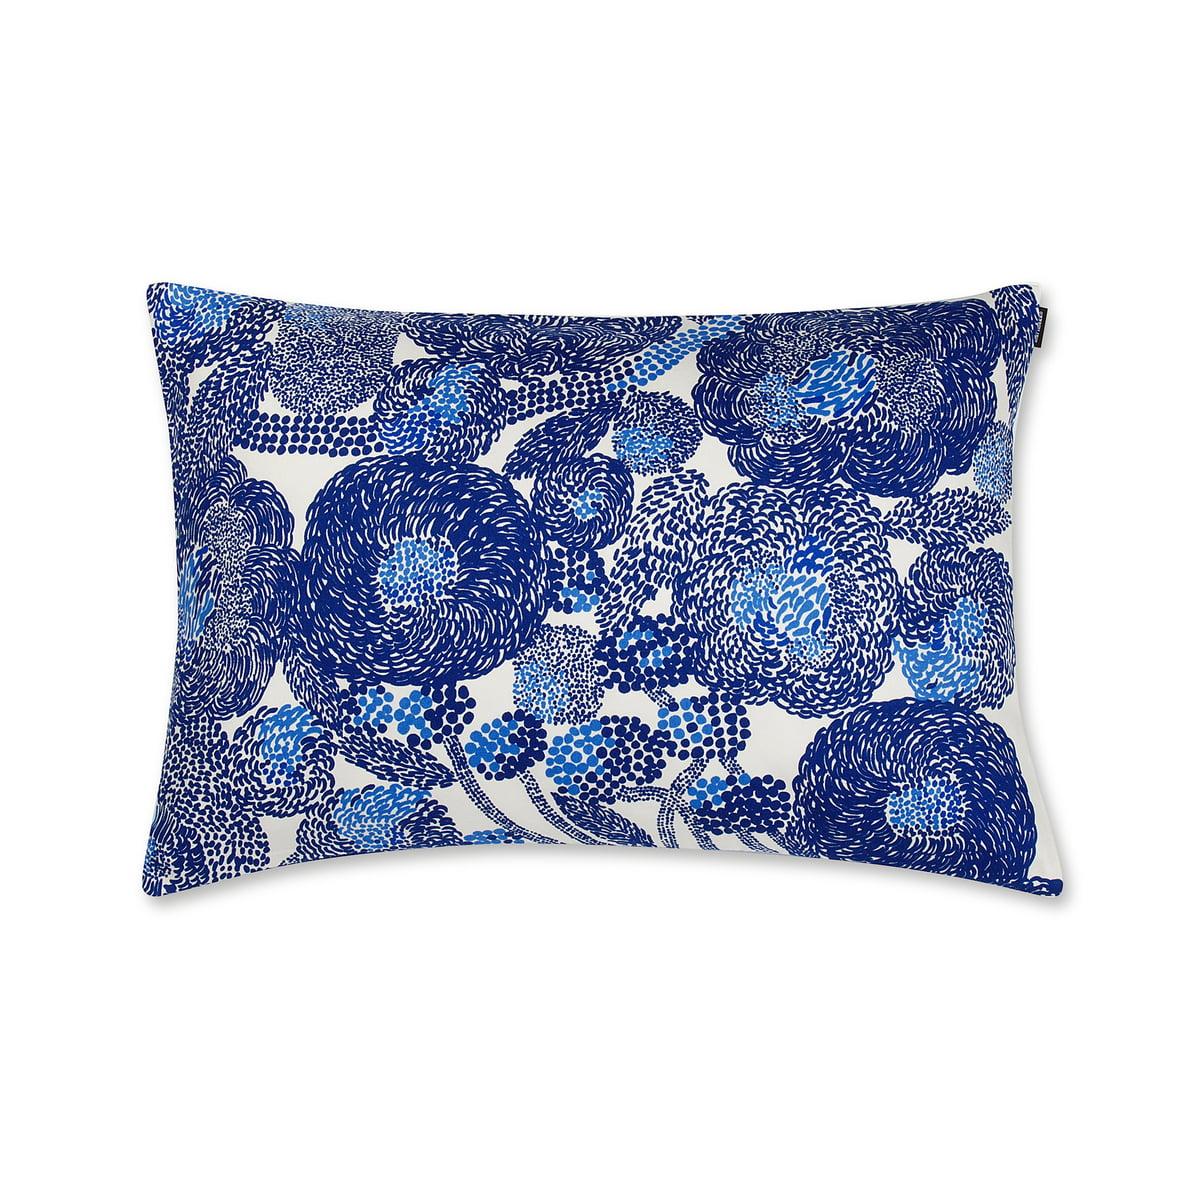 Mynsteri Cushion Cover 40 x 60 cm by Marimekko | Connox